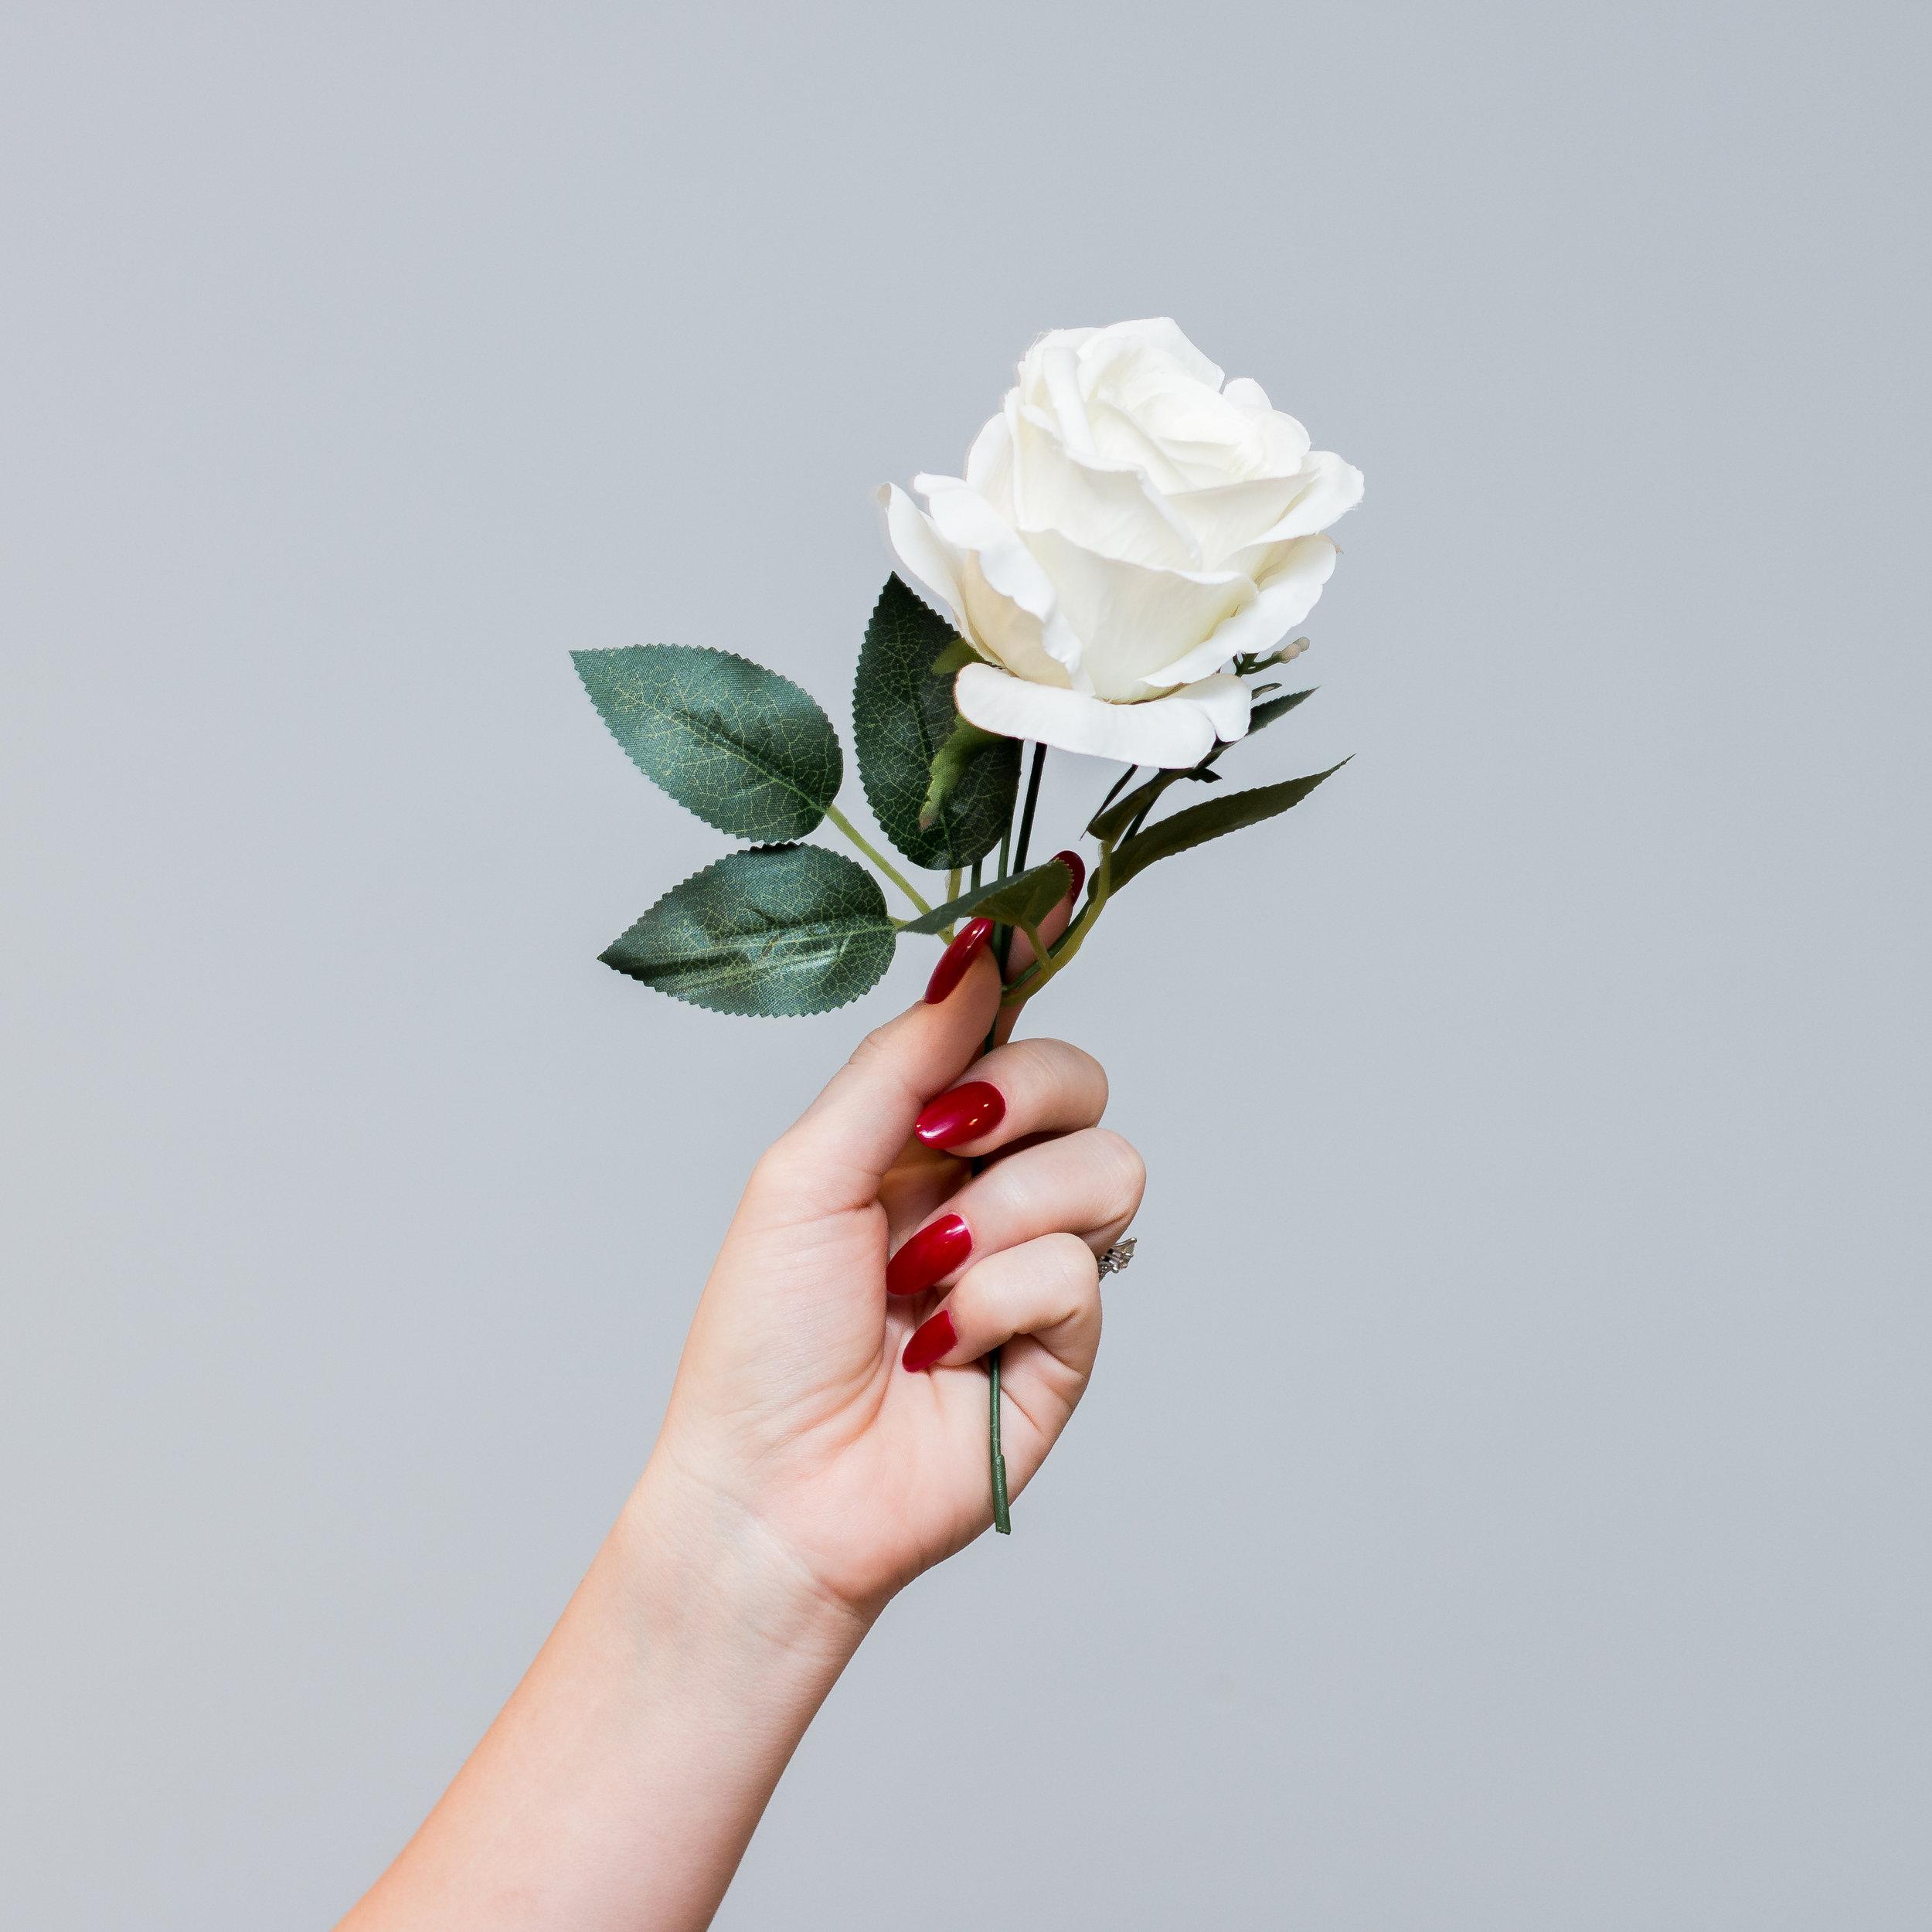 emilysotiphotography-roses-13.jpg